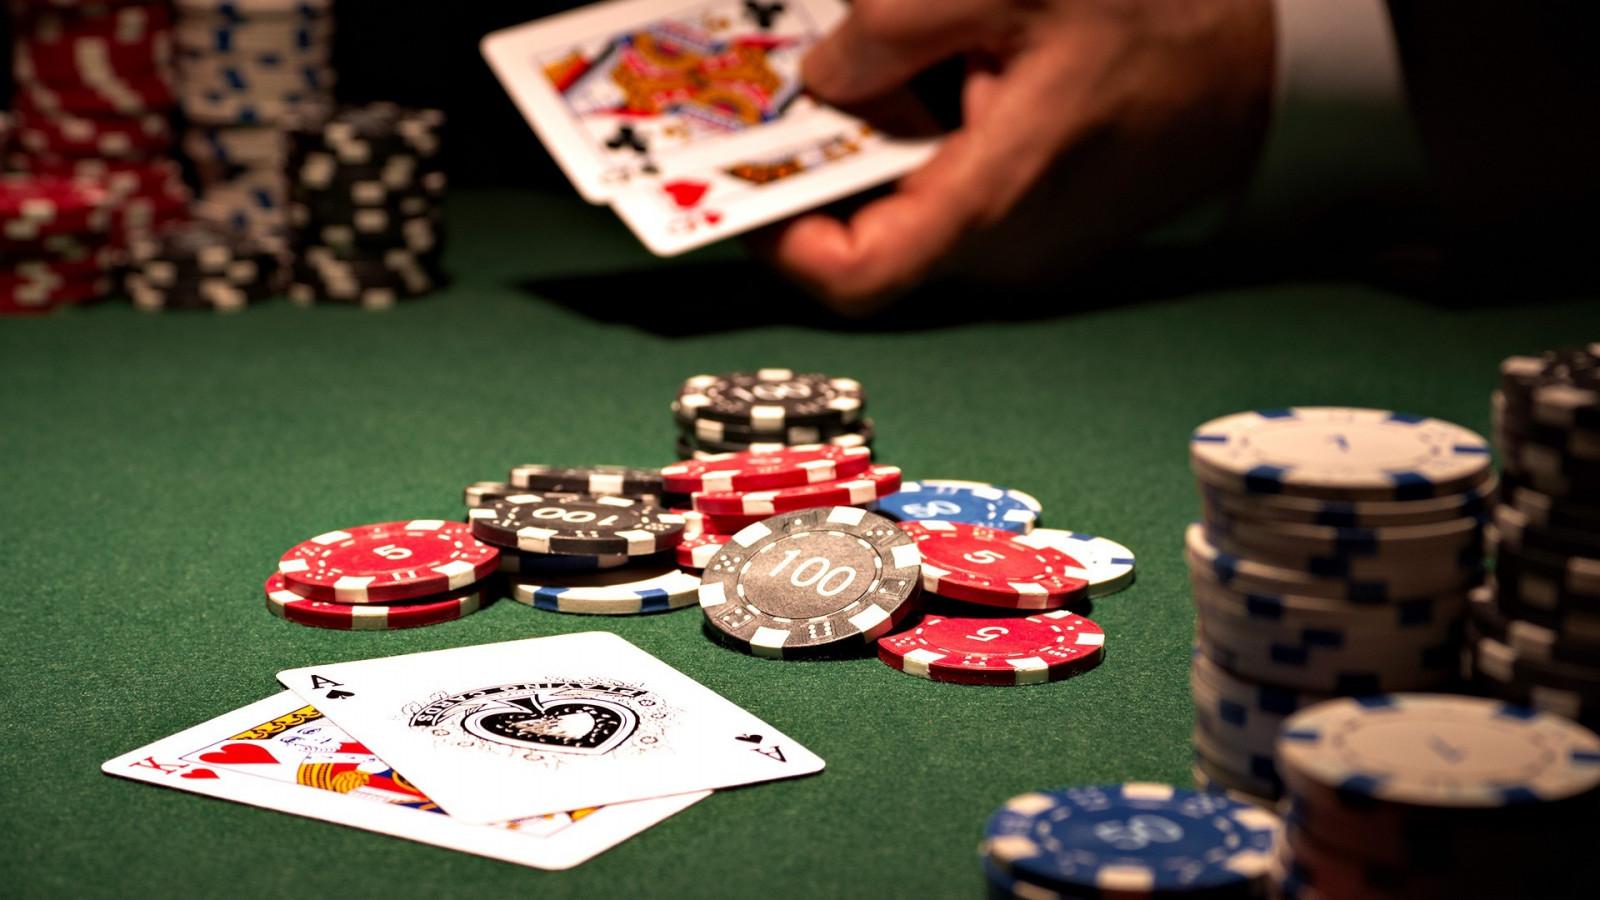 Wallpaper : poker, play, gambling, recreation, games, card game 1920x1080 - BoSsFiNaL4sRaT - 154391 - HD Wallpapers - WallHere